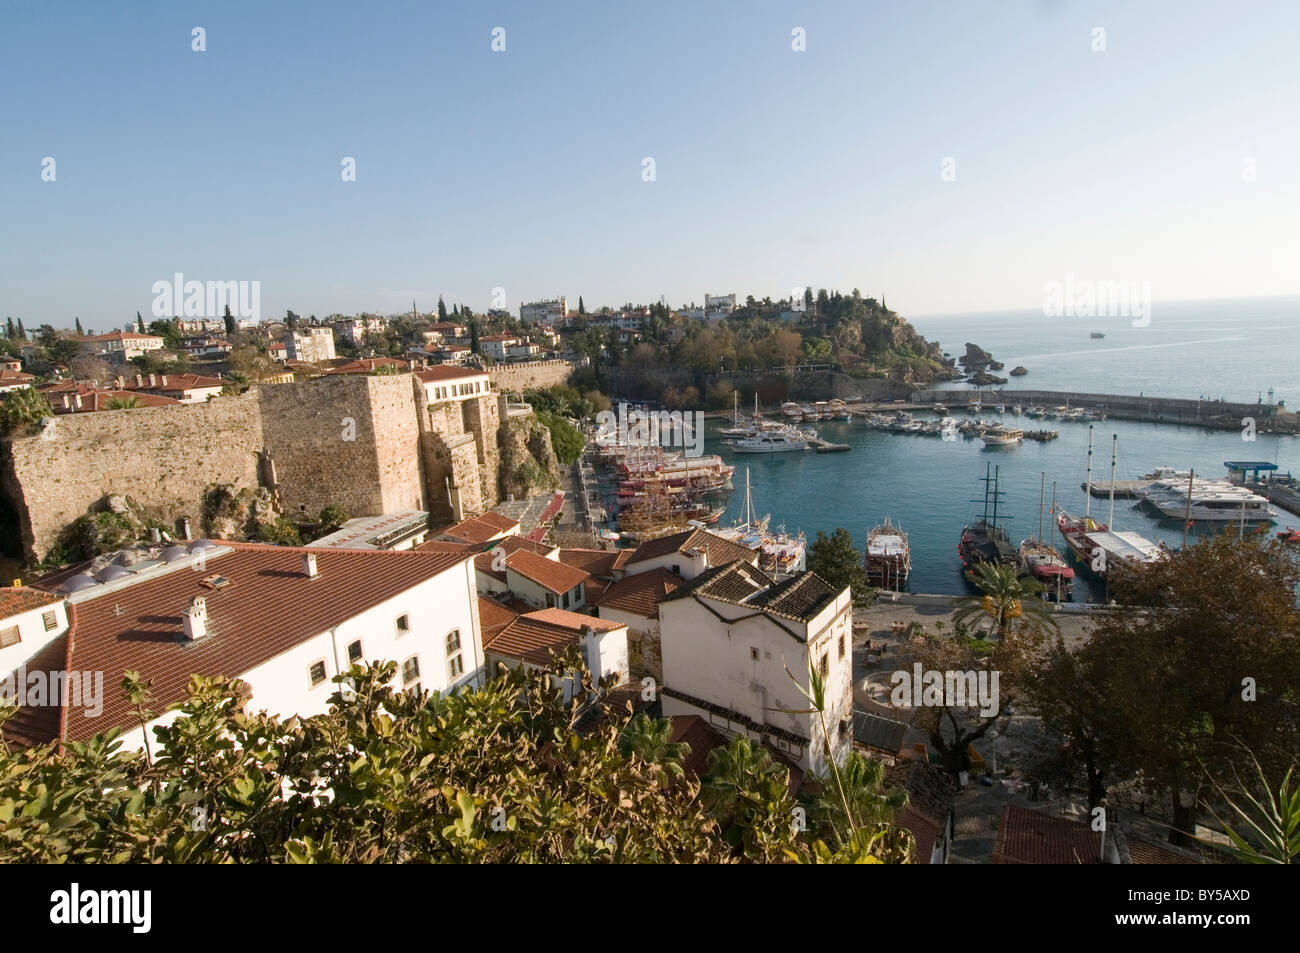 antalya harbor turkey turkish holiday resort old town destination tourist tourism vacation - Stock Image